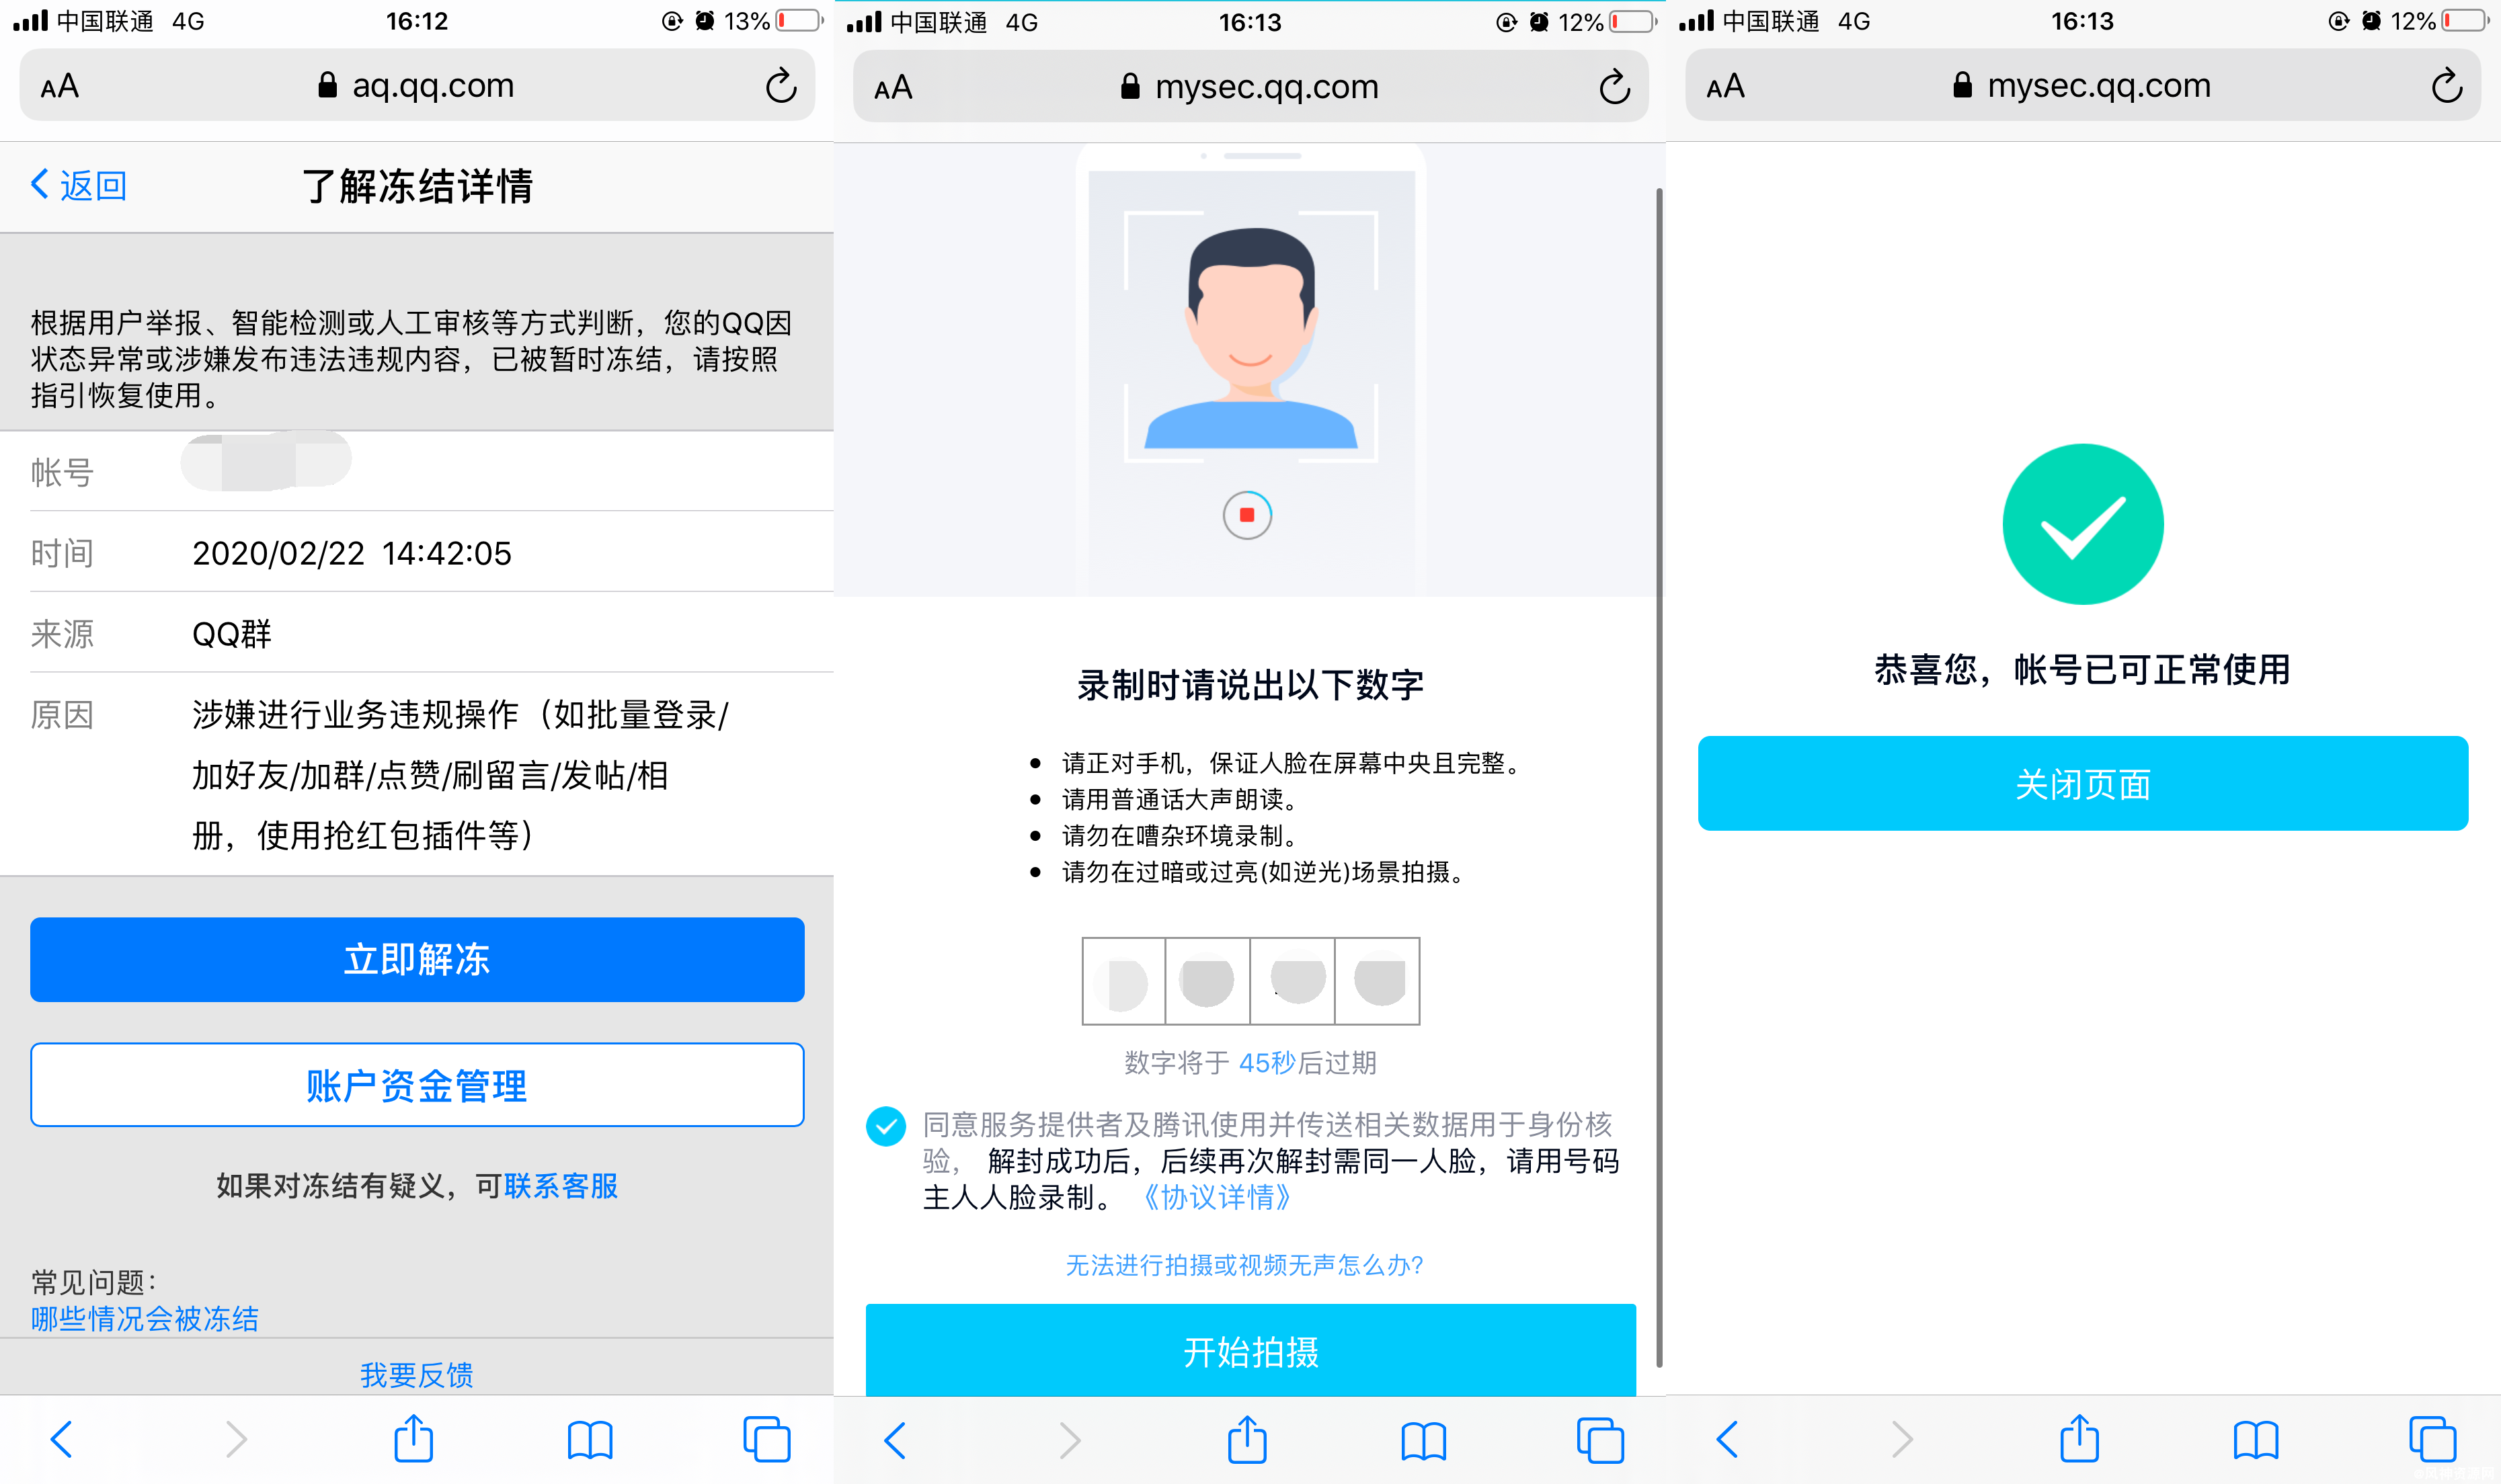 QQ账号被冻结了解封解冻教程